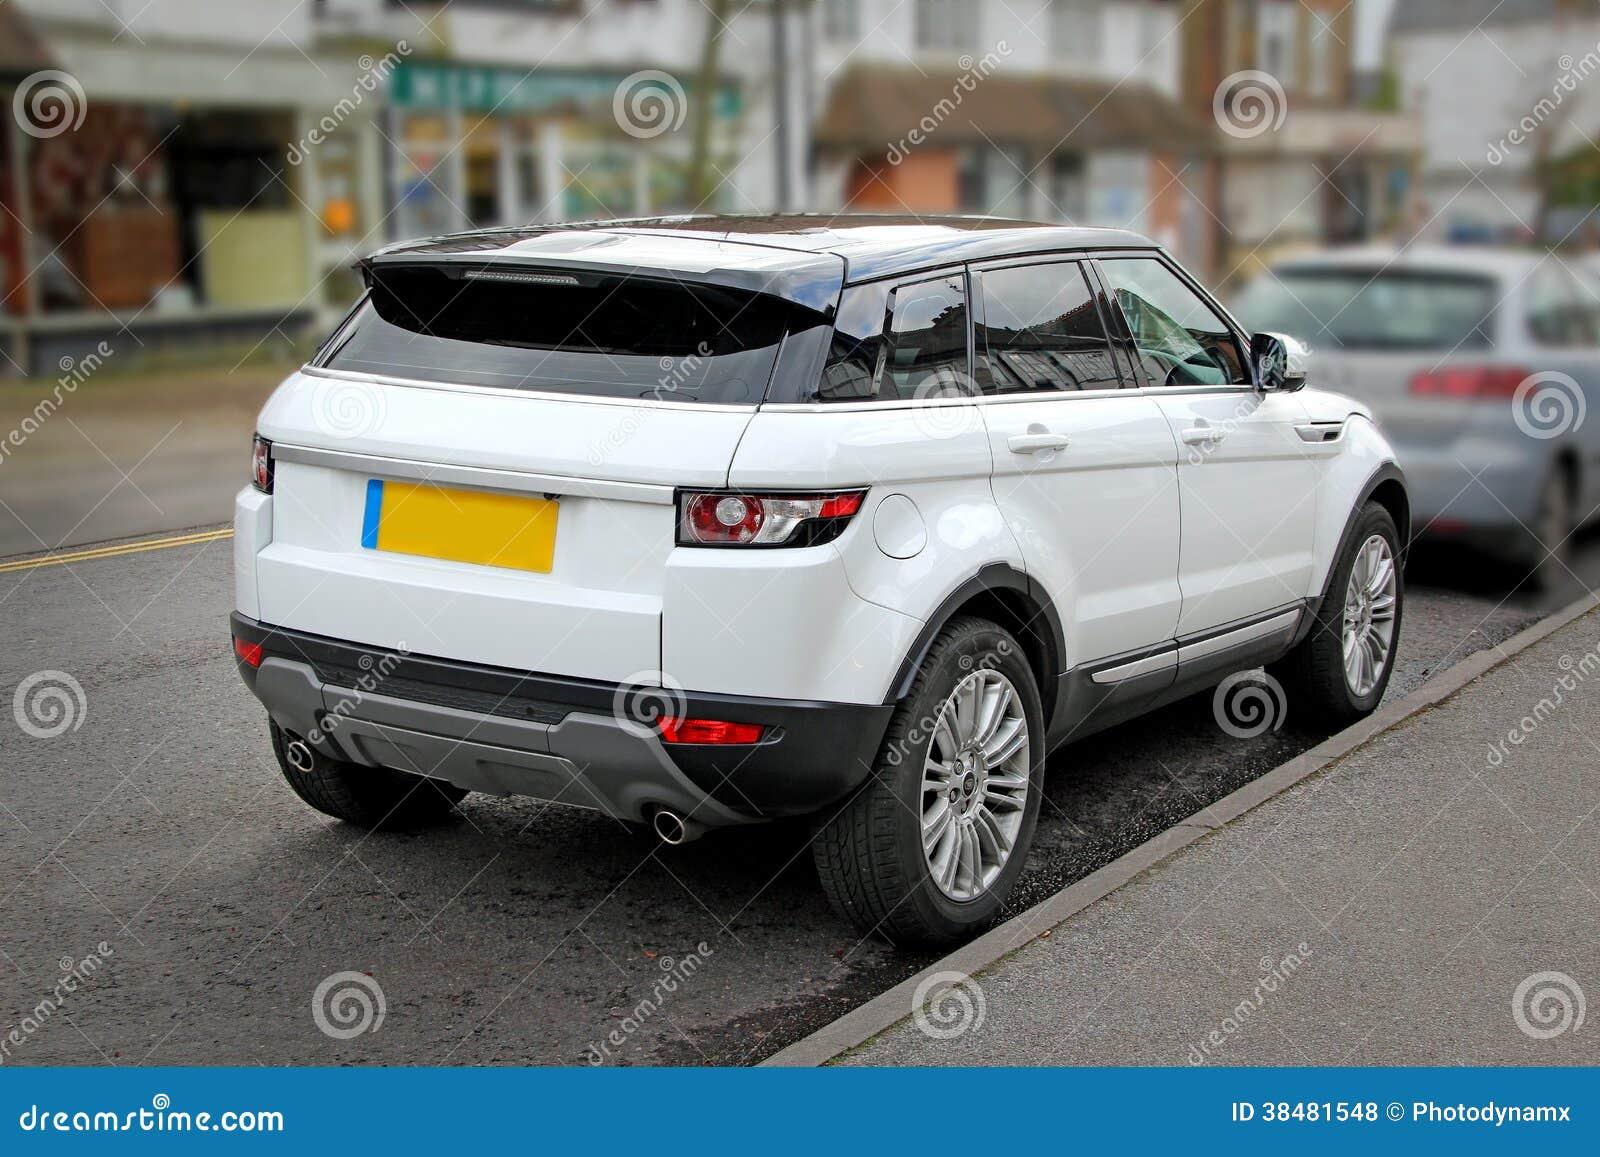 Range Rover New Model >> Land Rover White Model Royalty Free Stock Photos - Image: 38481548